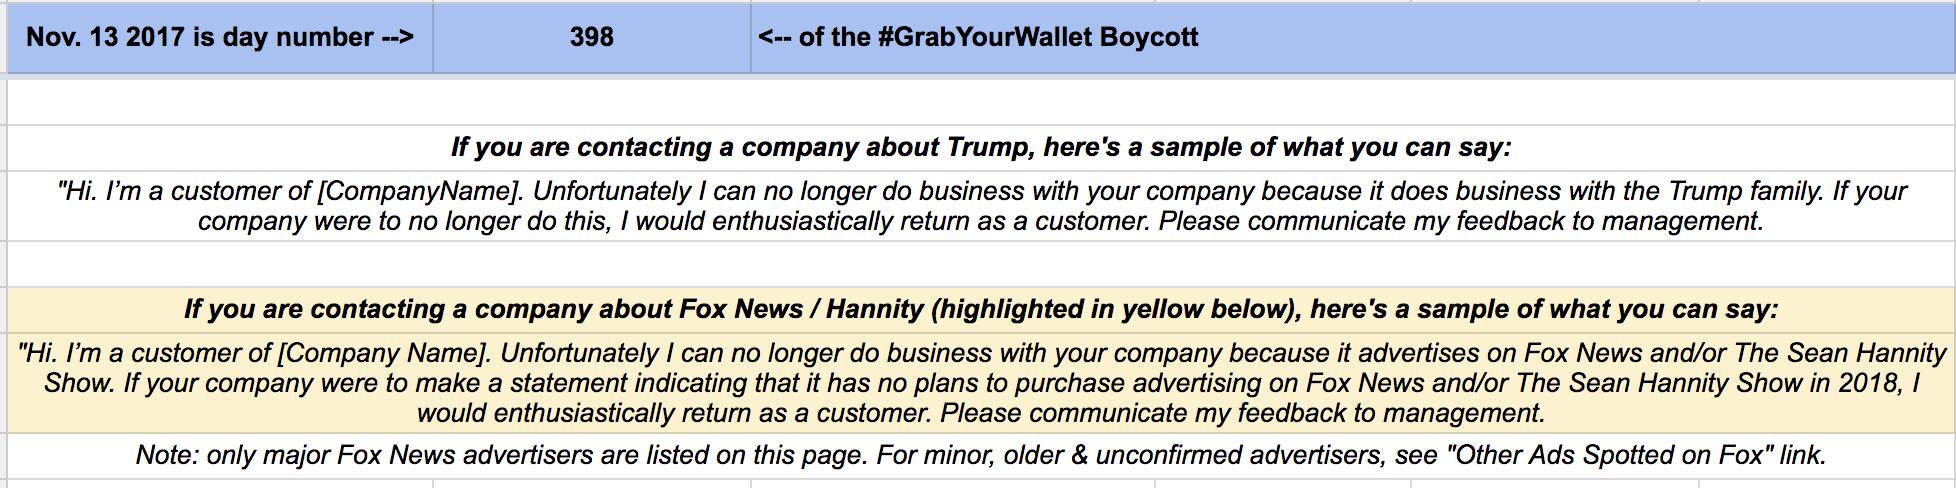 (Screenshot/GrabYourWallet.Org)